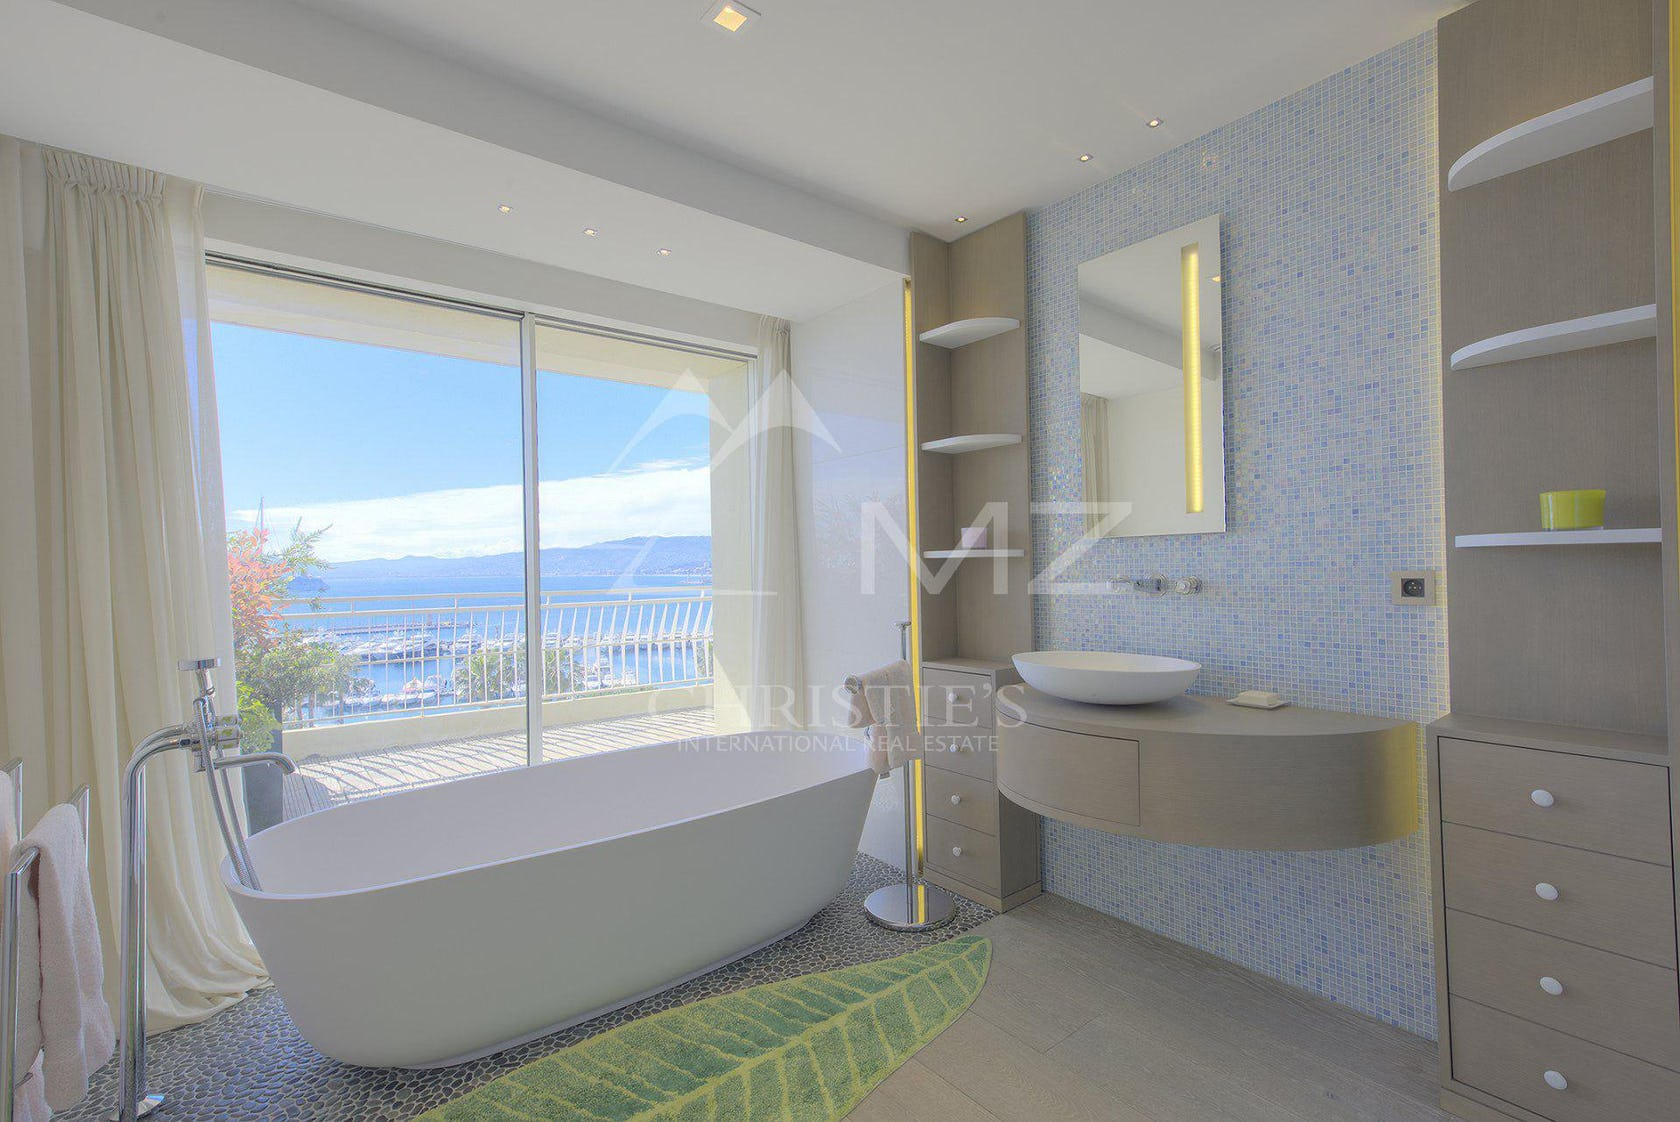 bathtub tub indoors room interior design